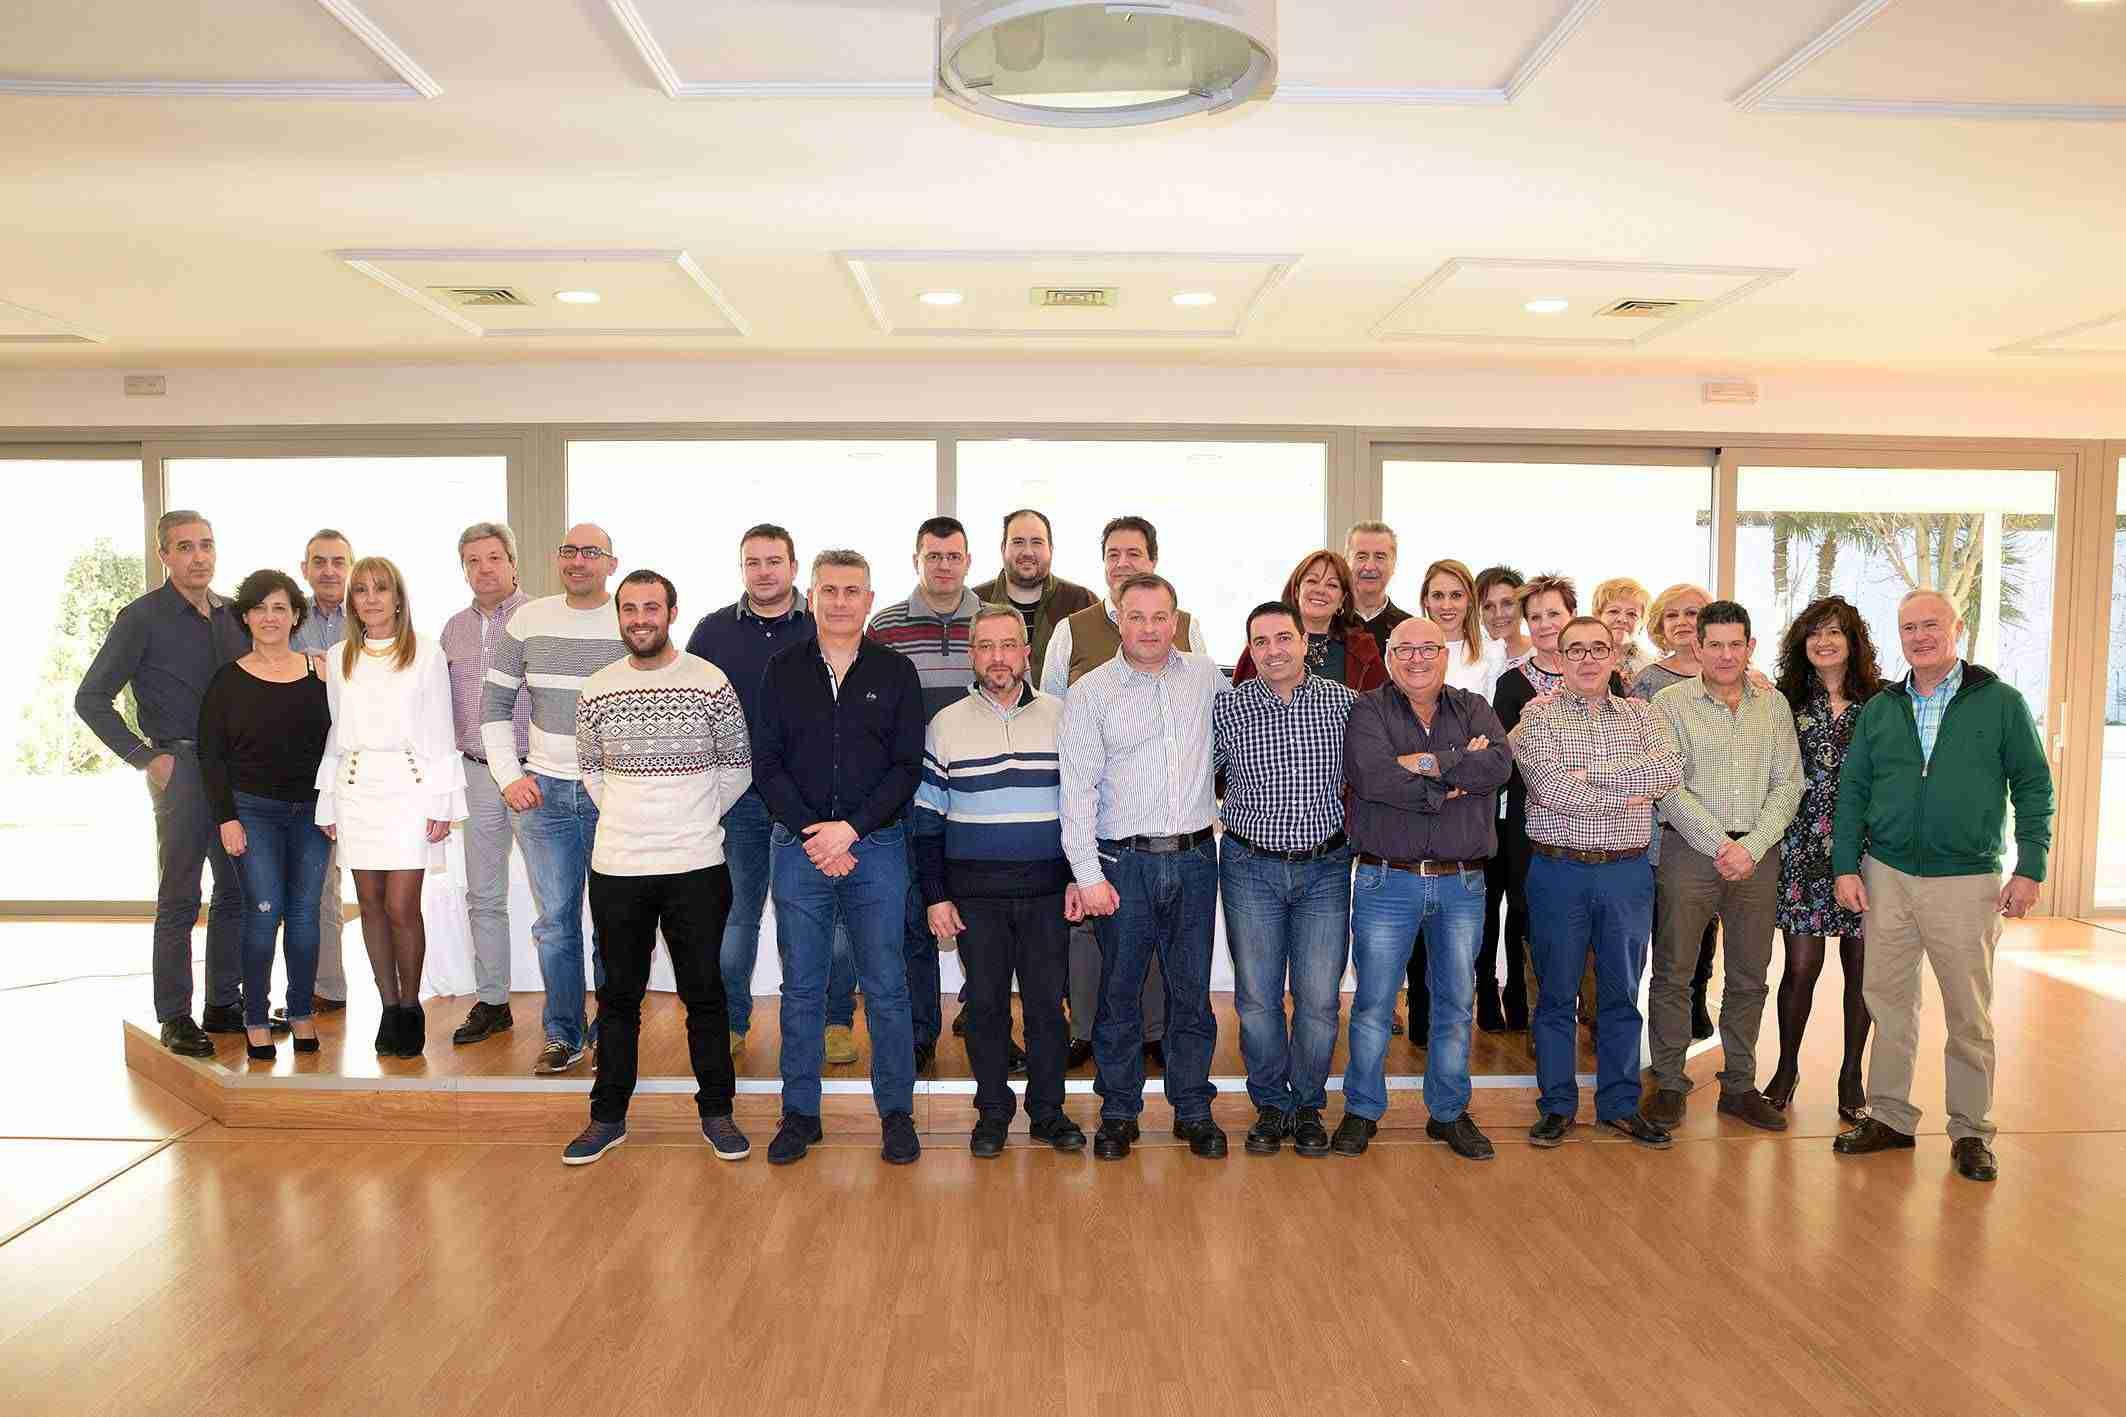 Argamasilla de Alba acogió la entrega de trofeos del XXXII Torneo Regional Interclubes 2017 de tiro olímpico 6